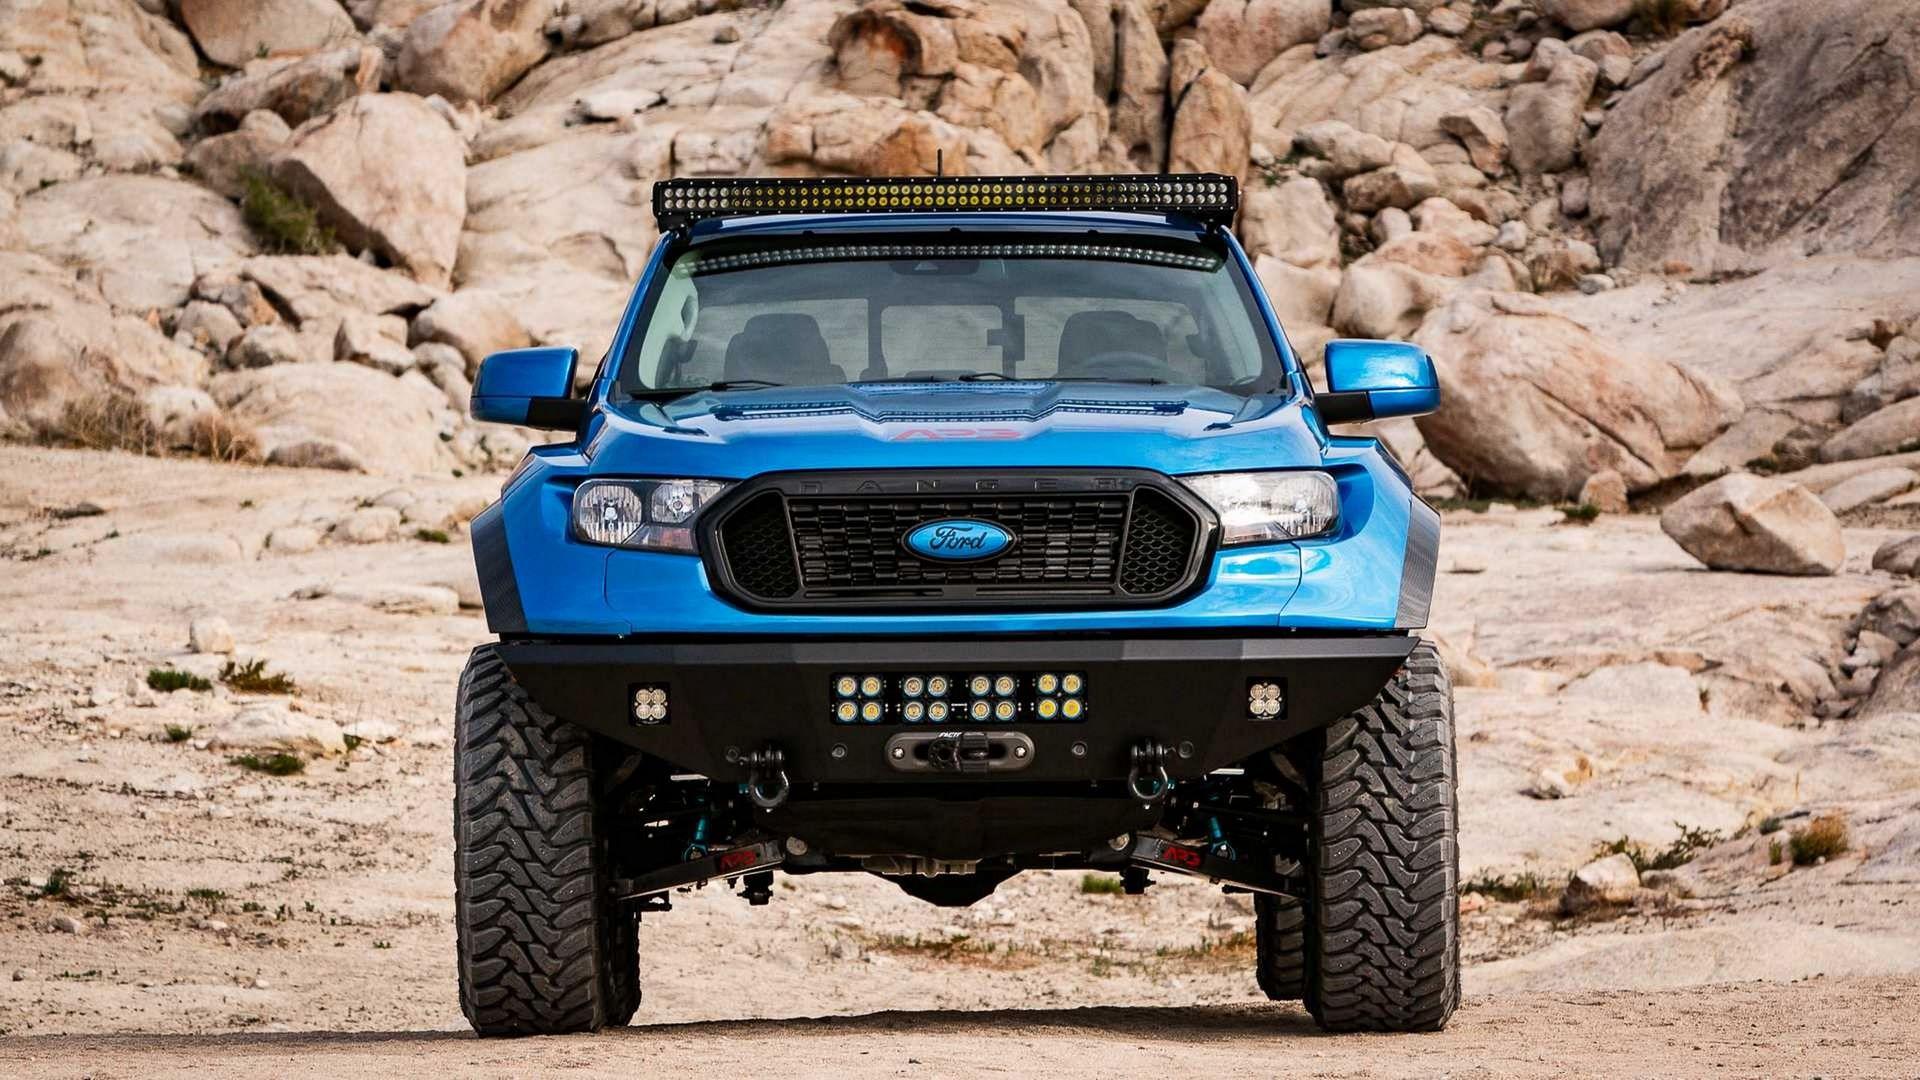 Ford-Ranger-Prorunner-By-APG-12